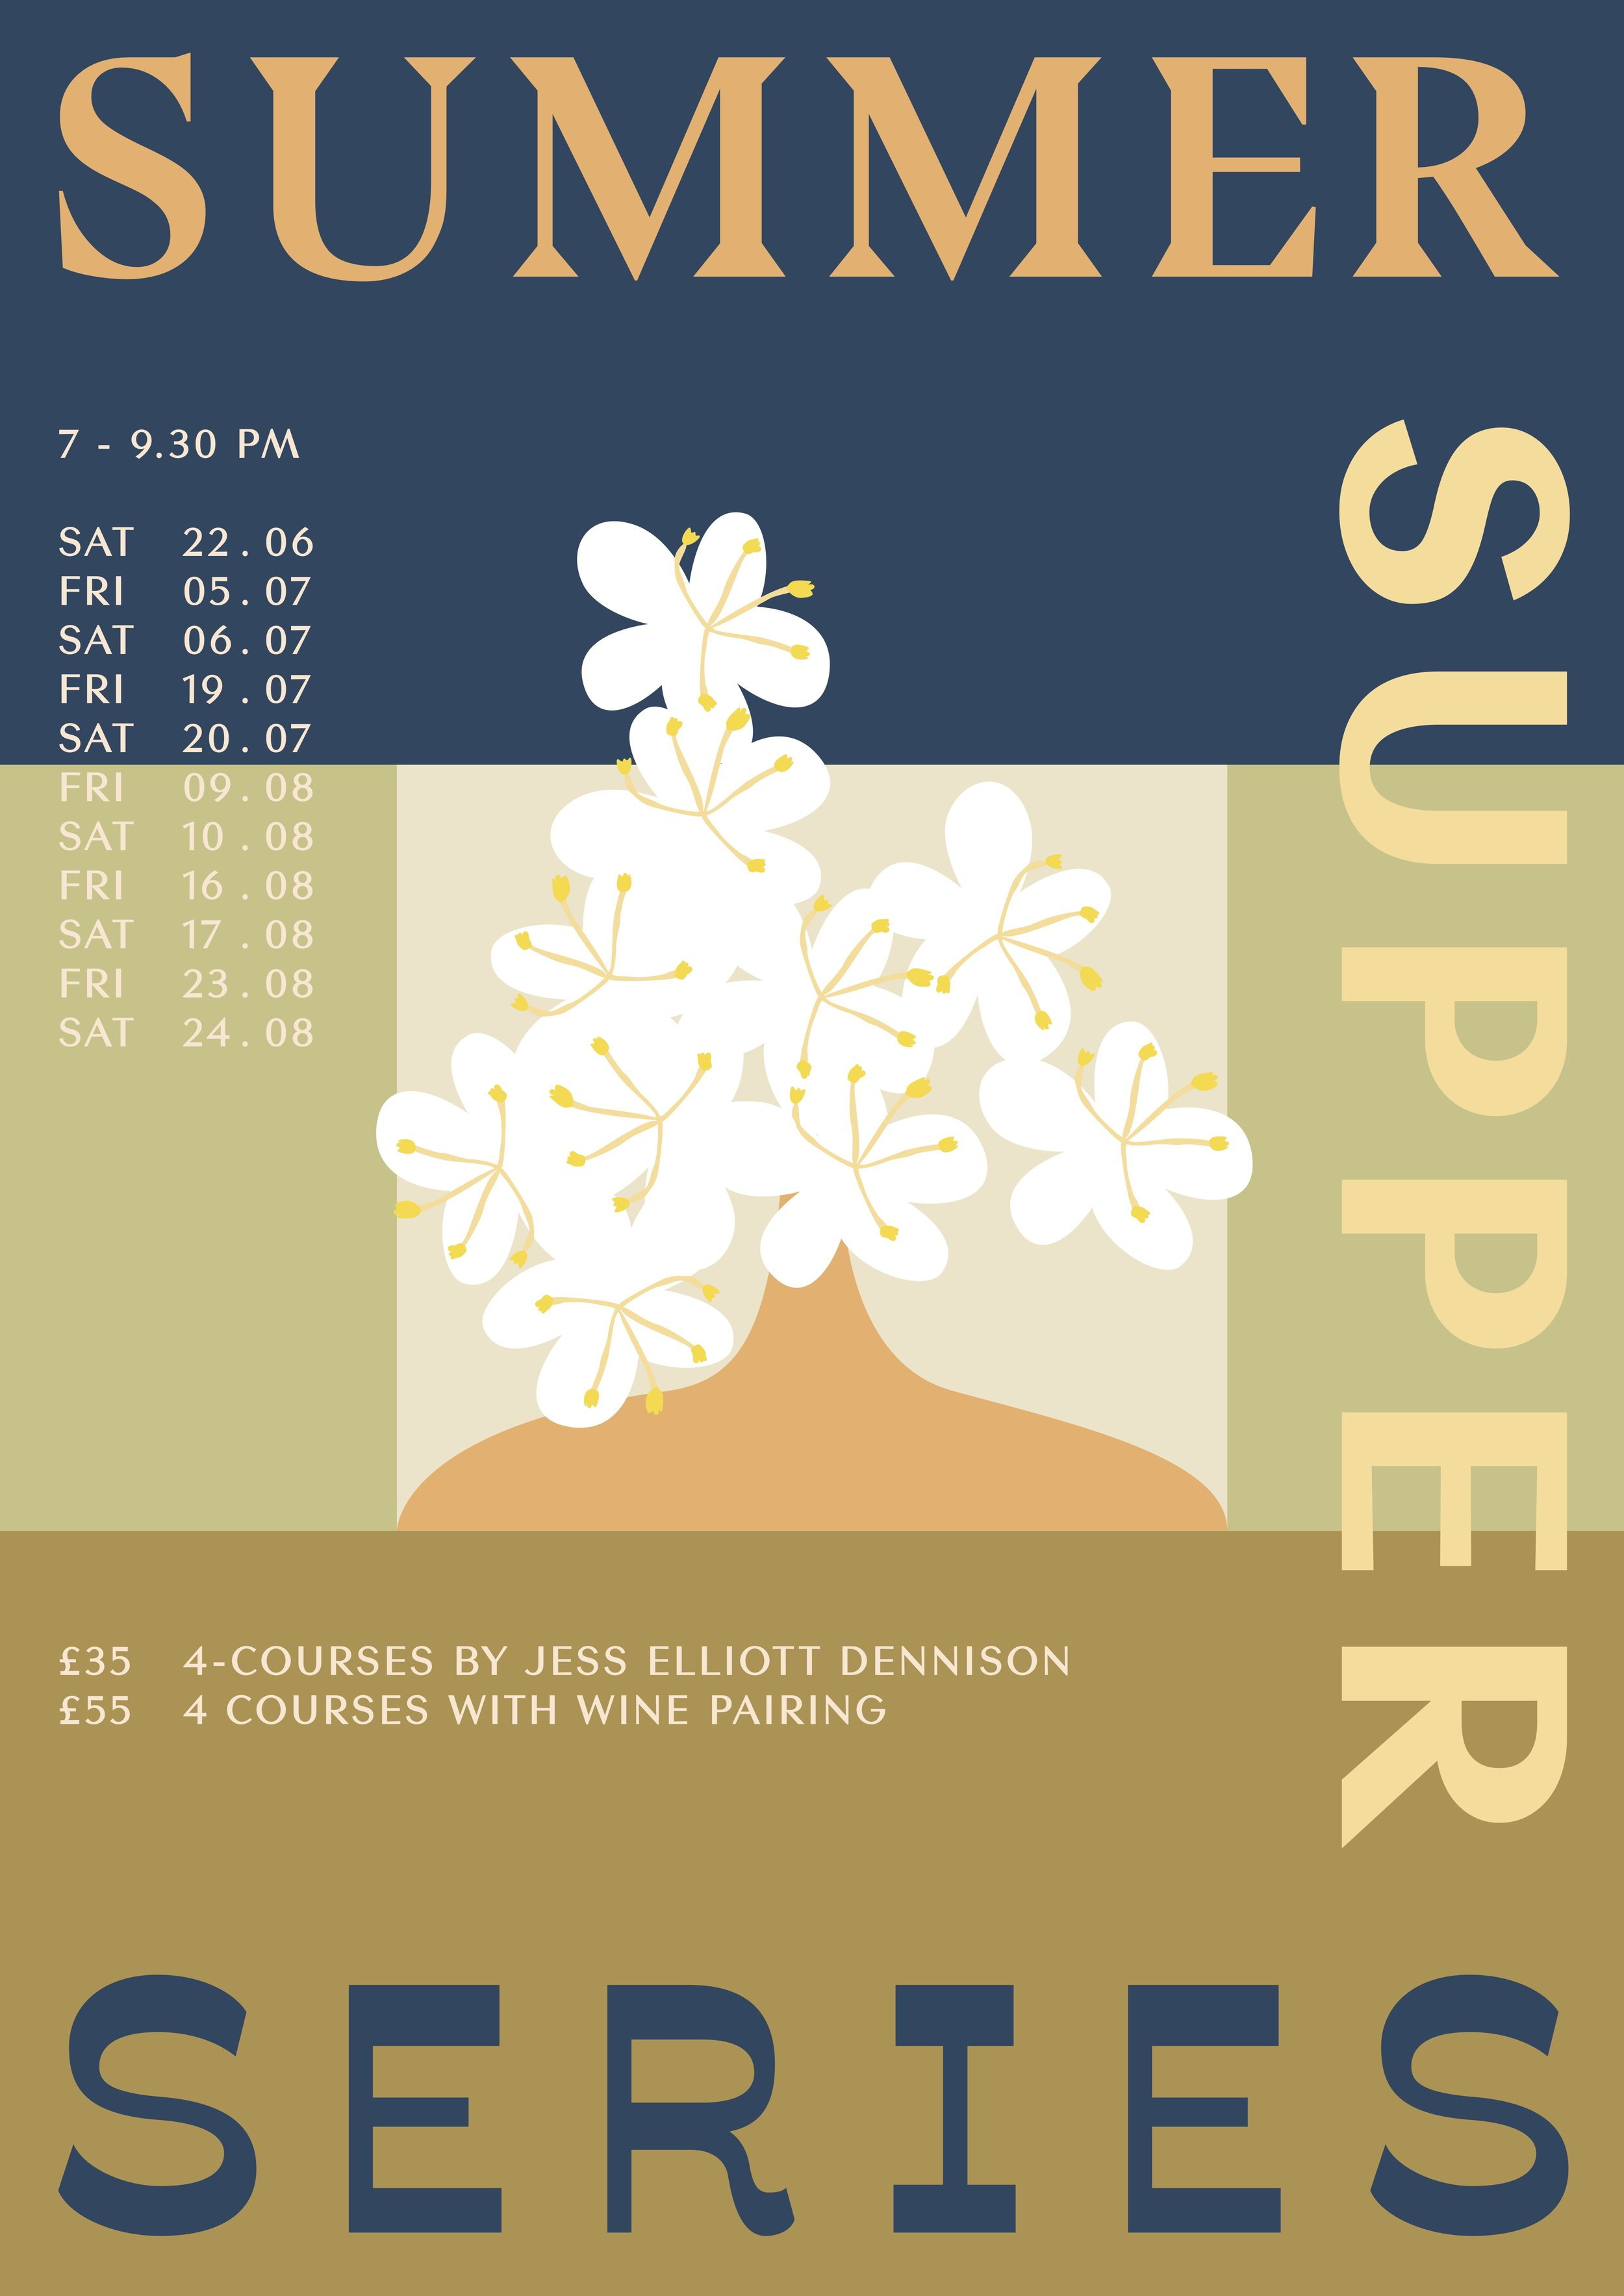 27E_SummerSupper2019_Poster-nocropmarks.jpg